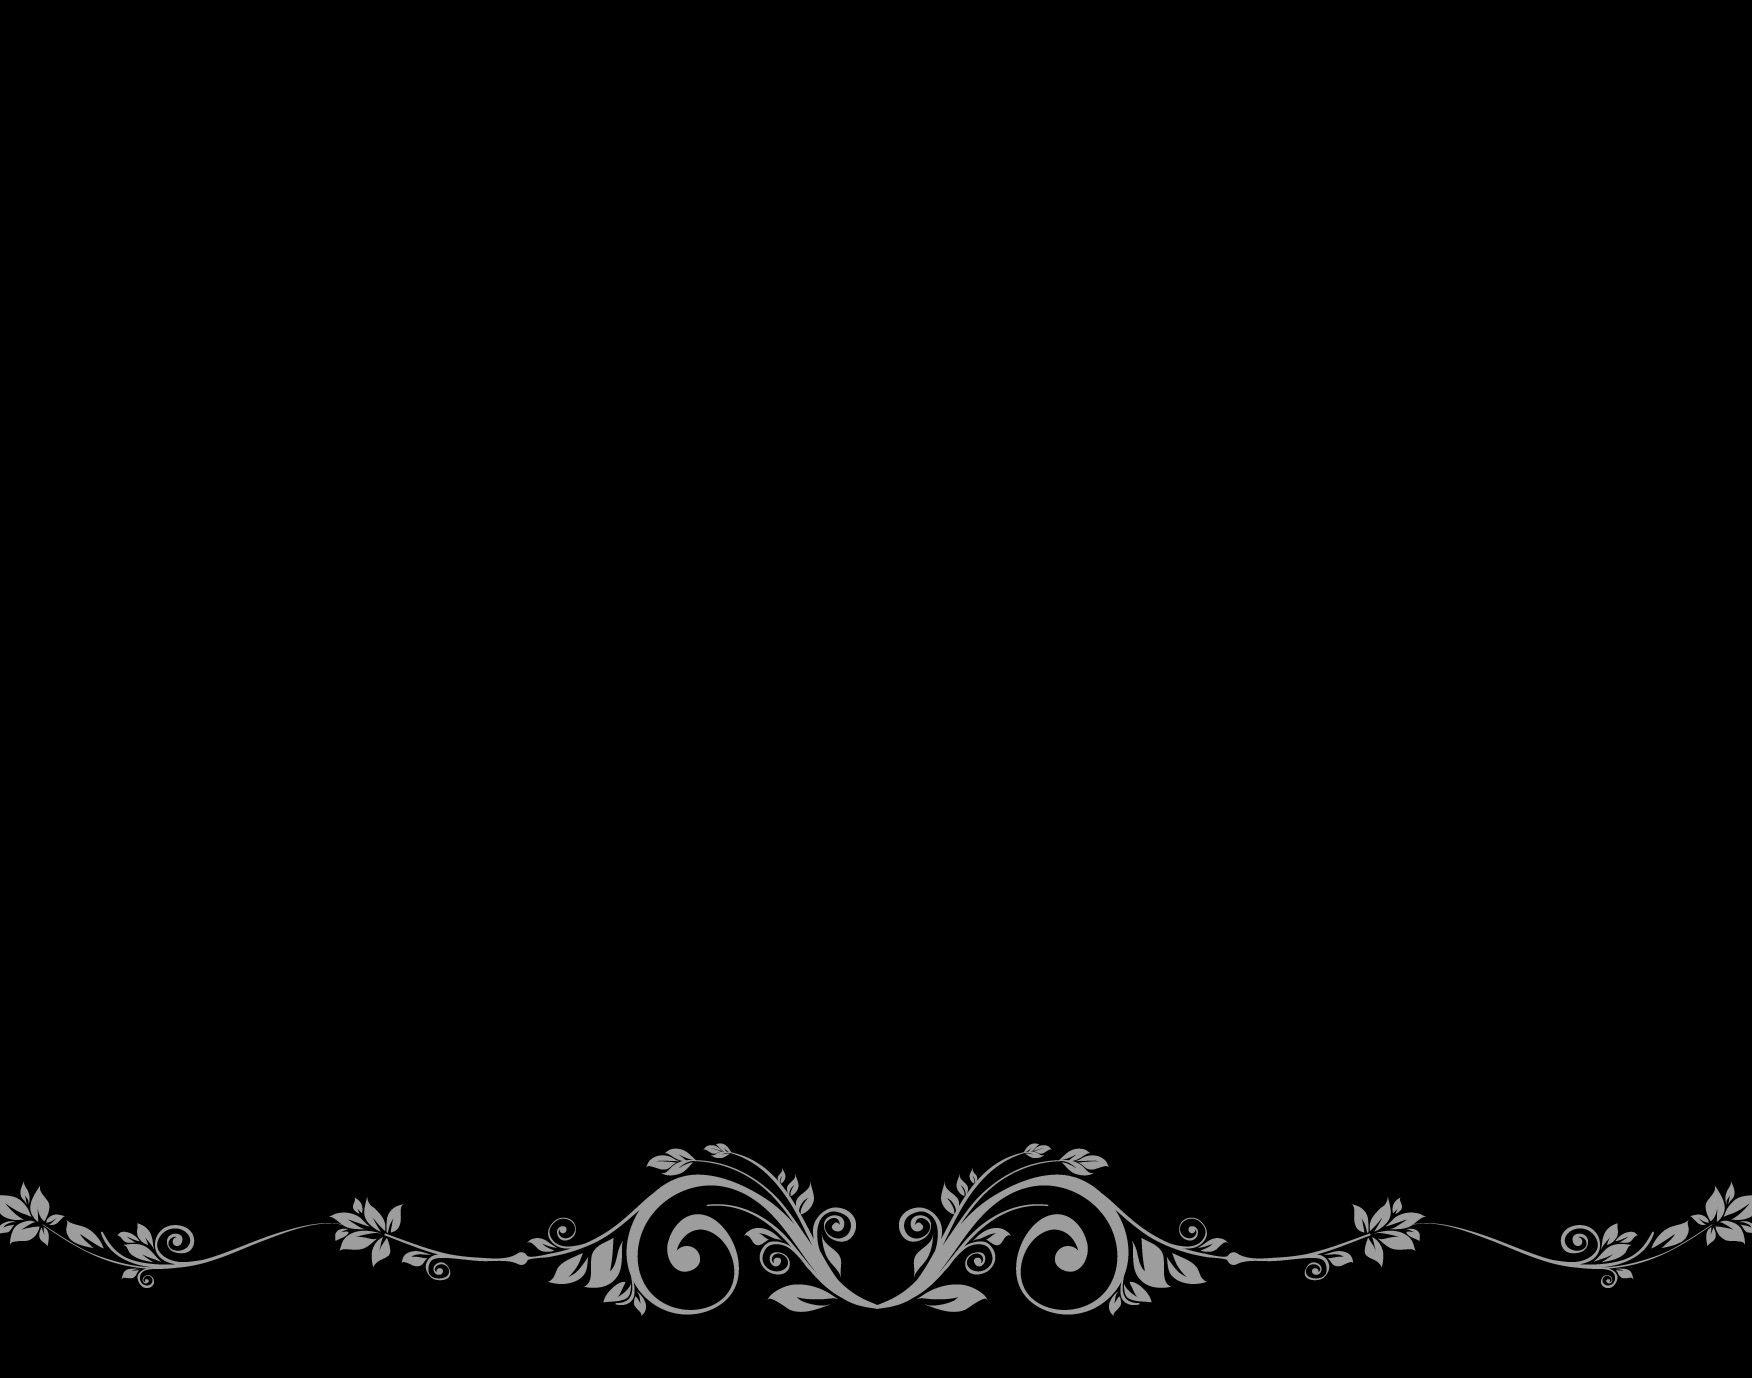 Elegant Black Border Backgrounds Dark Black Wallpaper Borders And Frames Worship Backgrounds